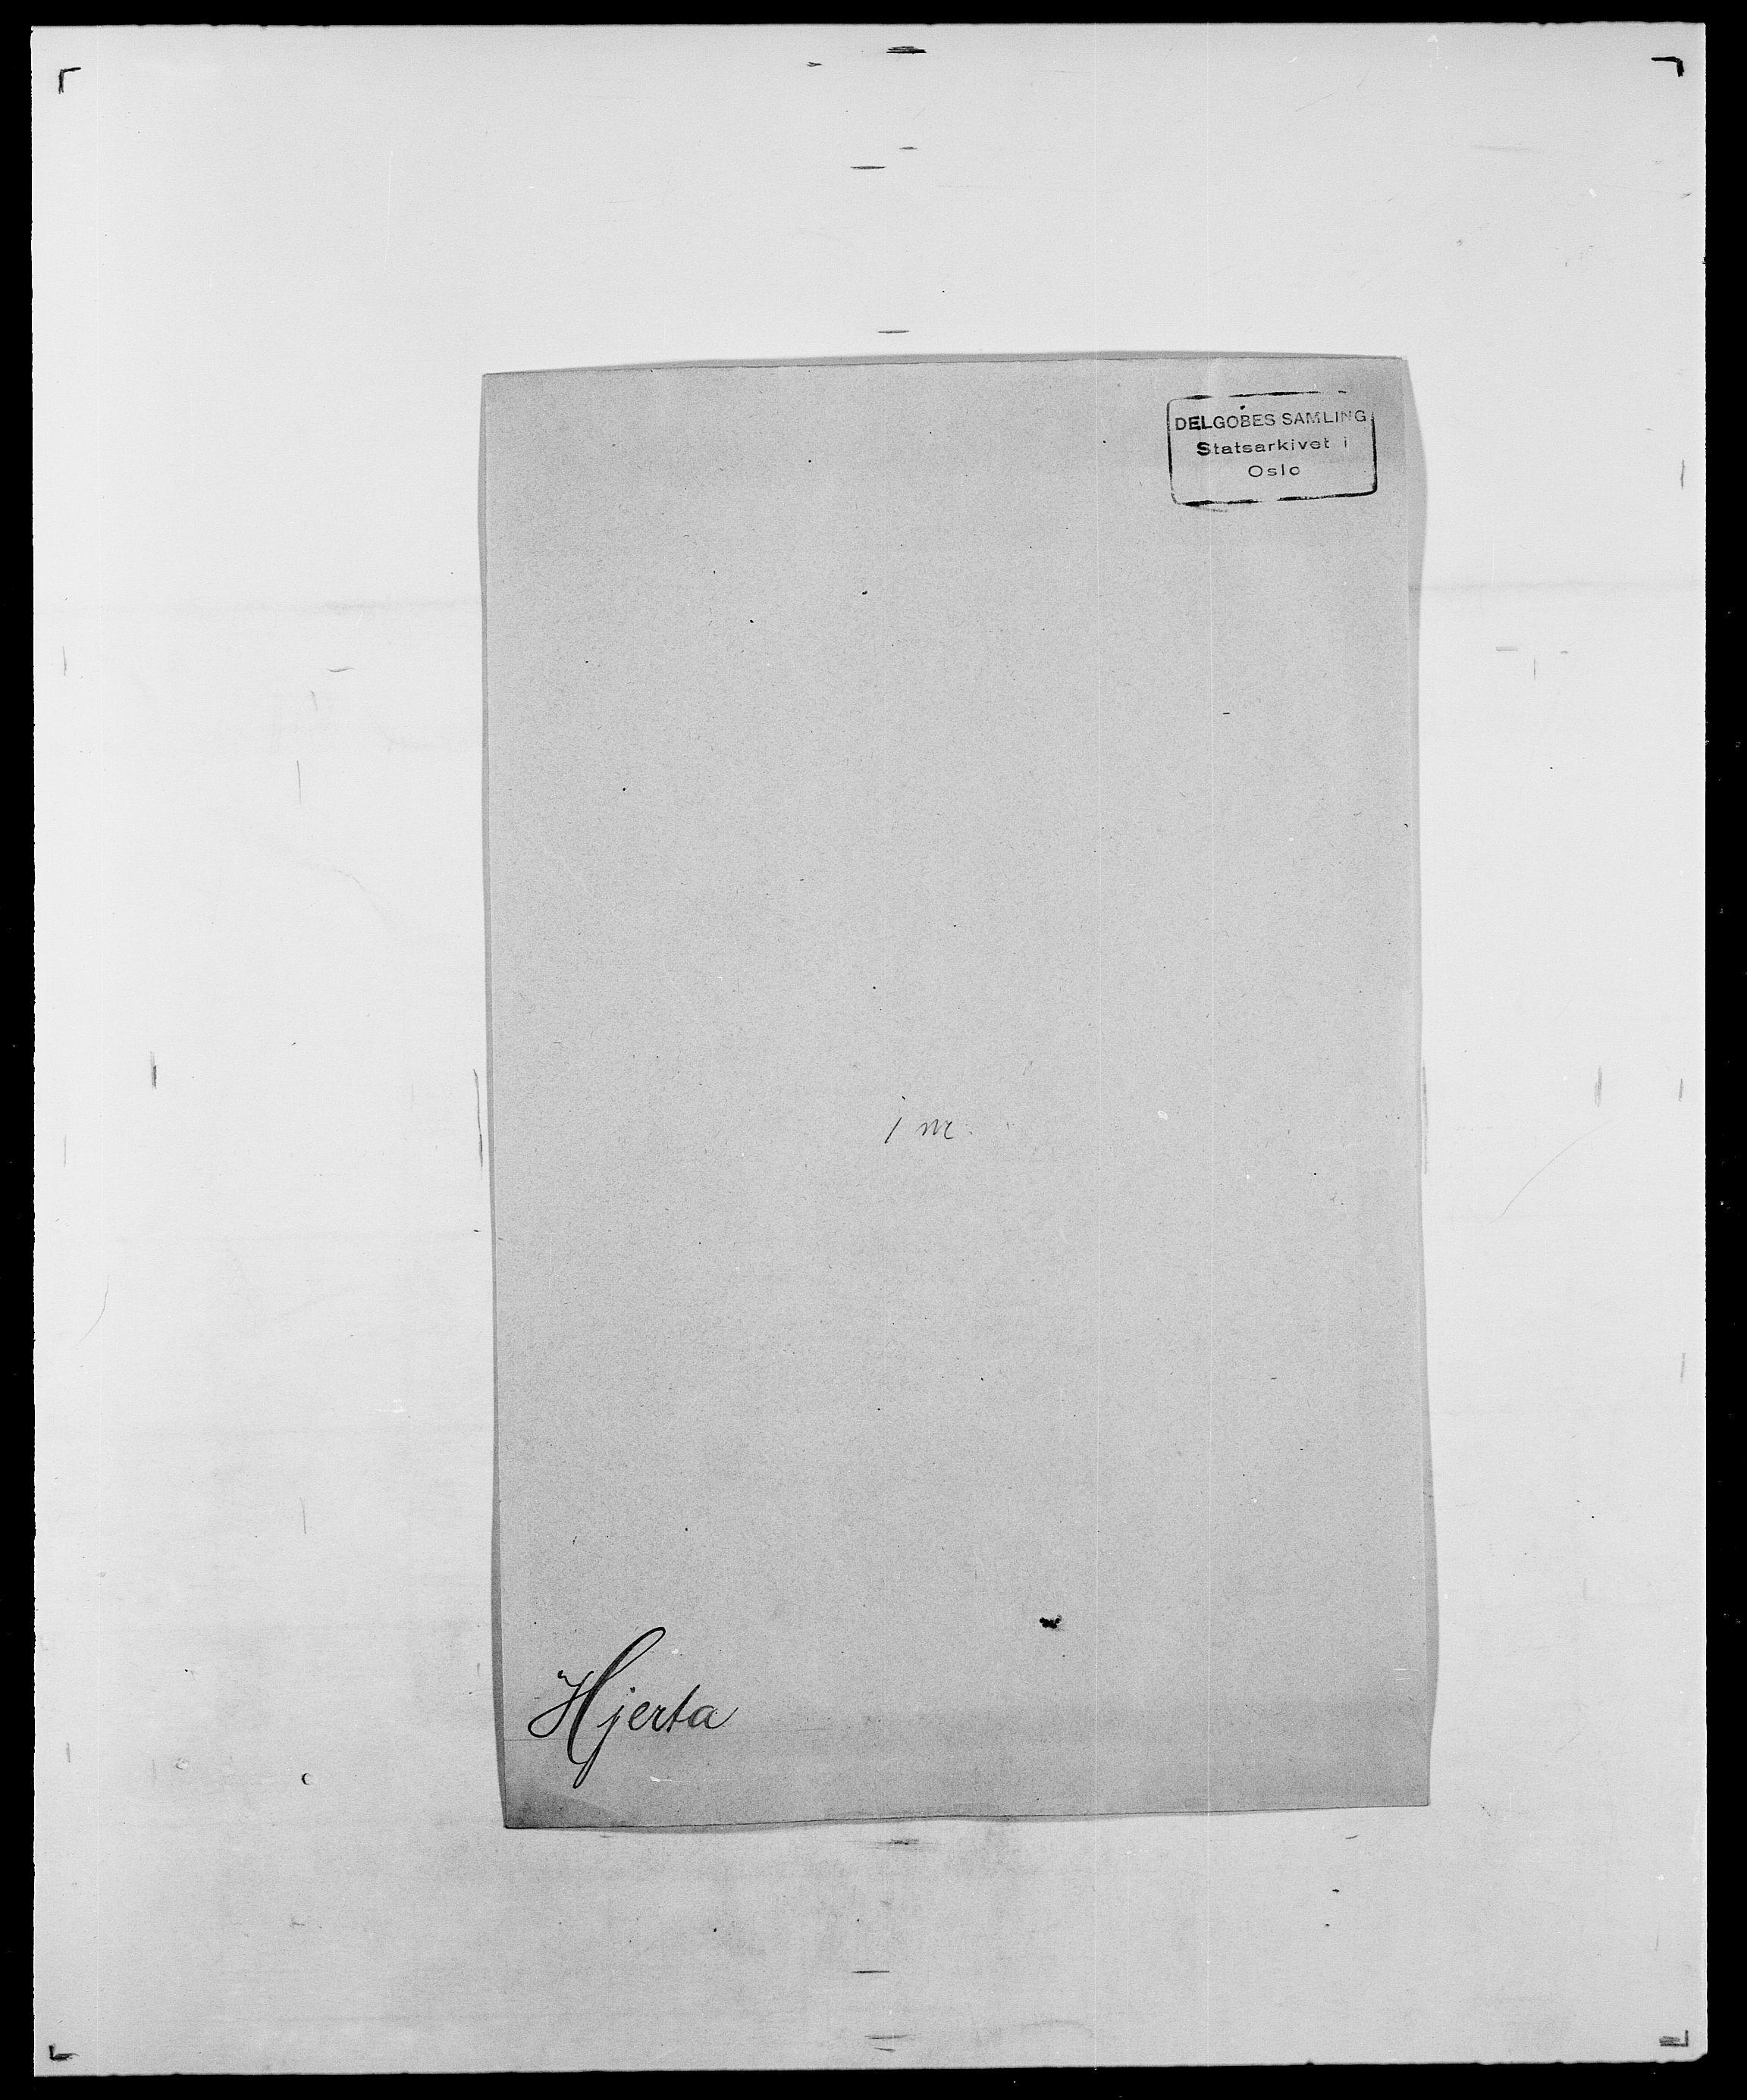 SAO, Delgobe, Charles Antoine - samling, D/Da/L0017: Helander - Hjørne, s. 564